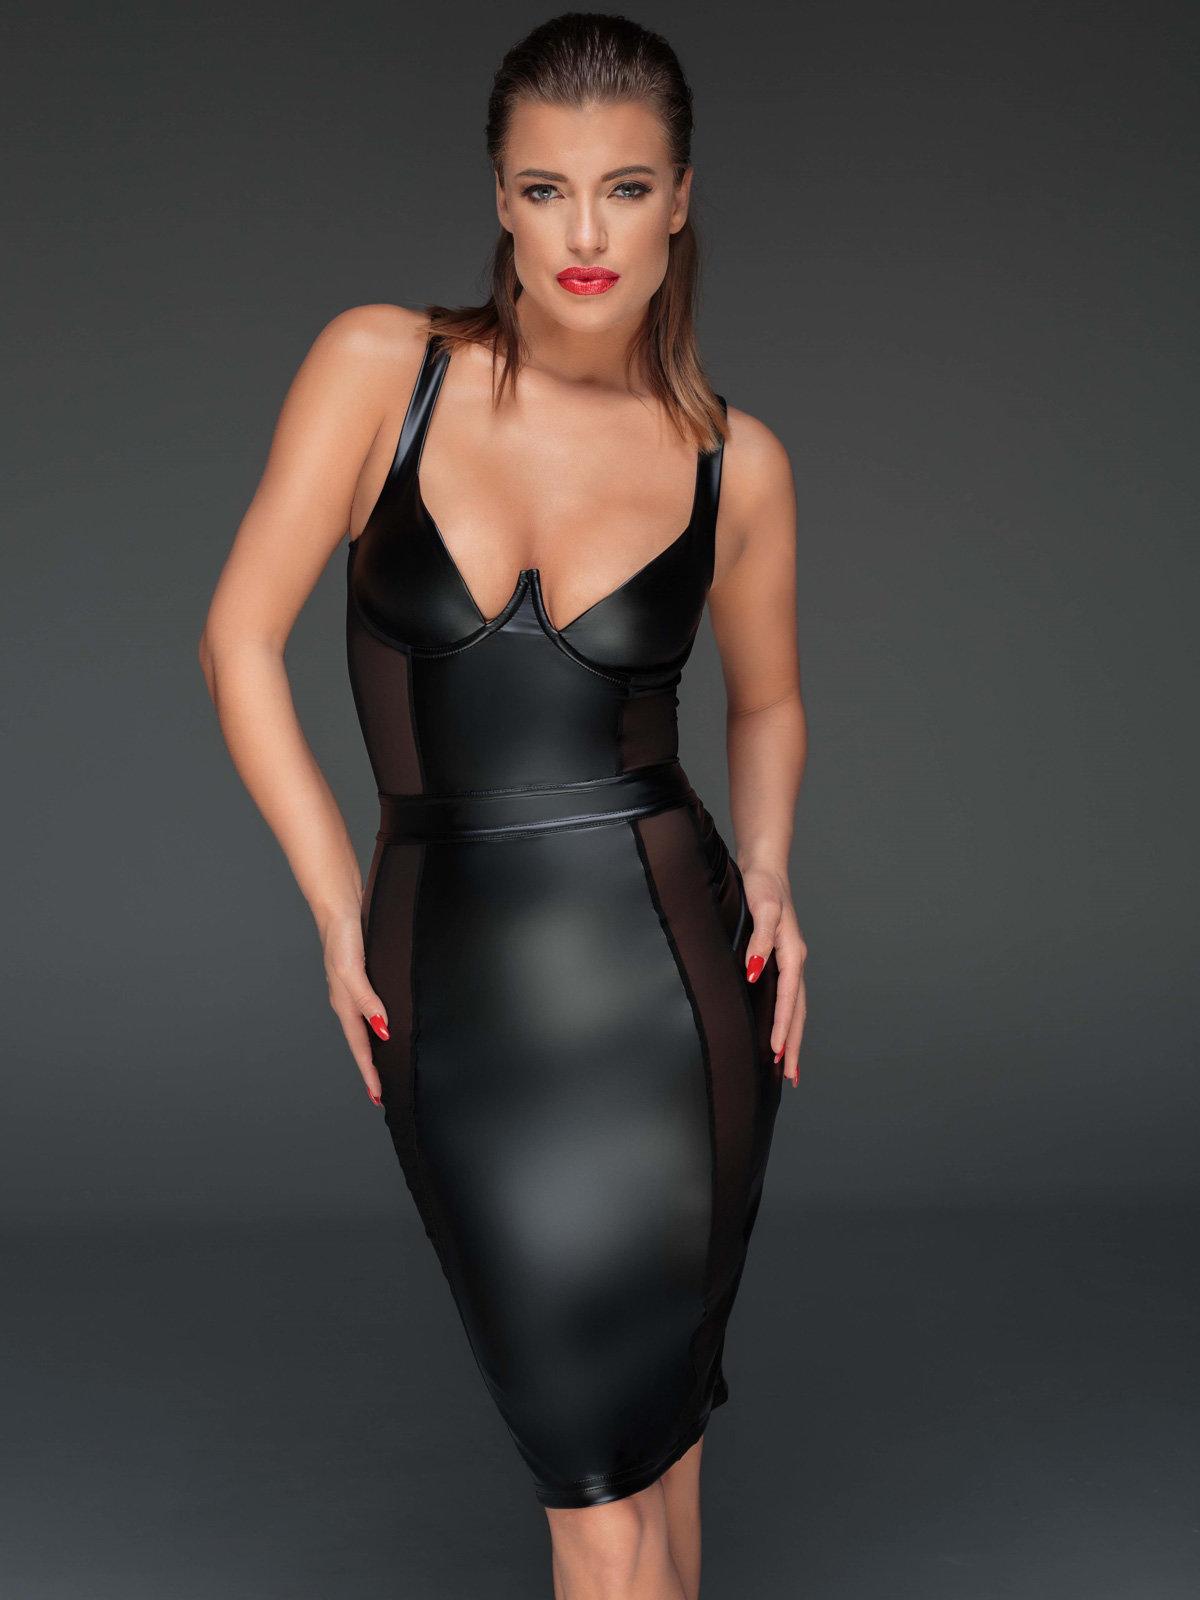 Chemise Powerwetlook pencil dress 2 Negru de la Noir Handmade